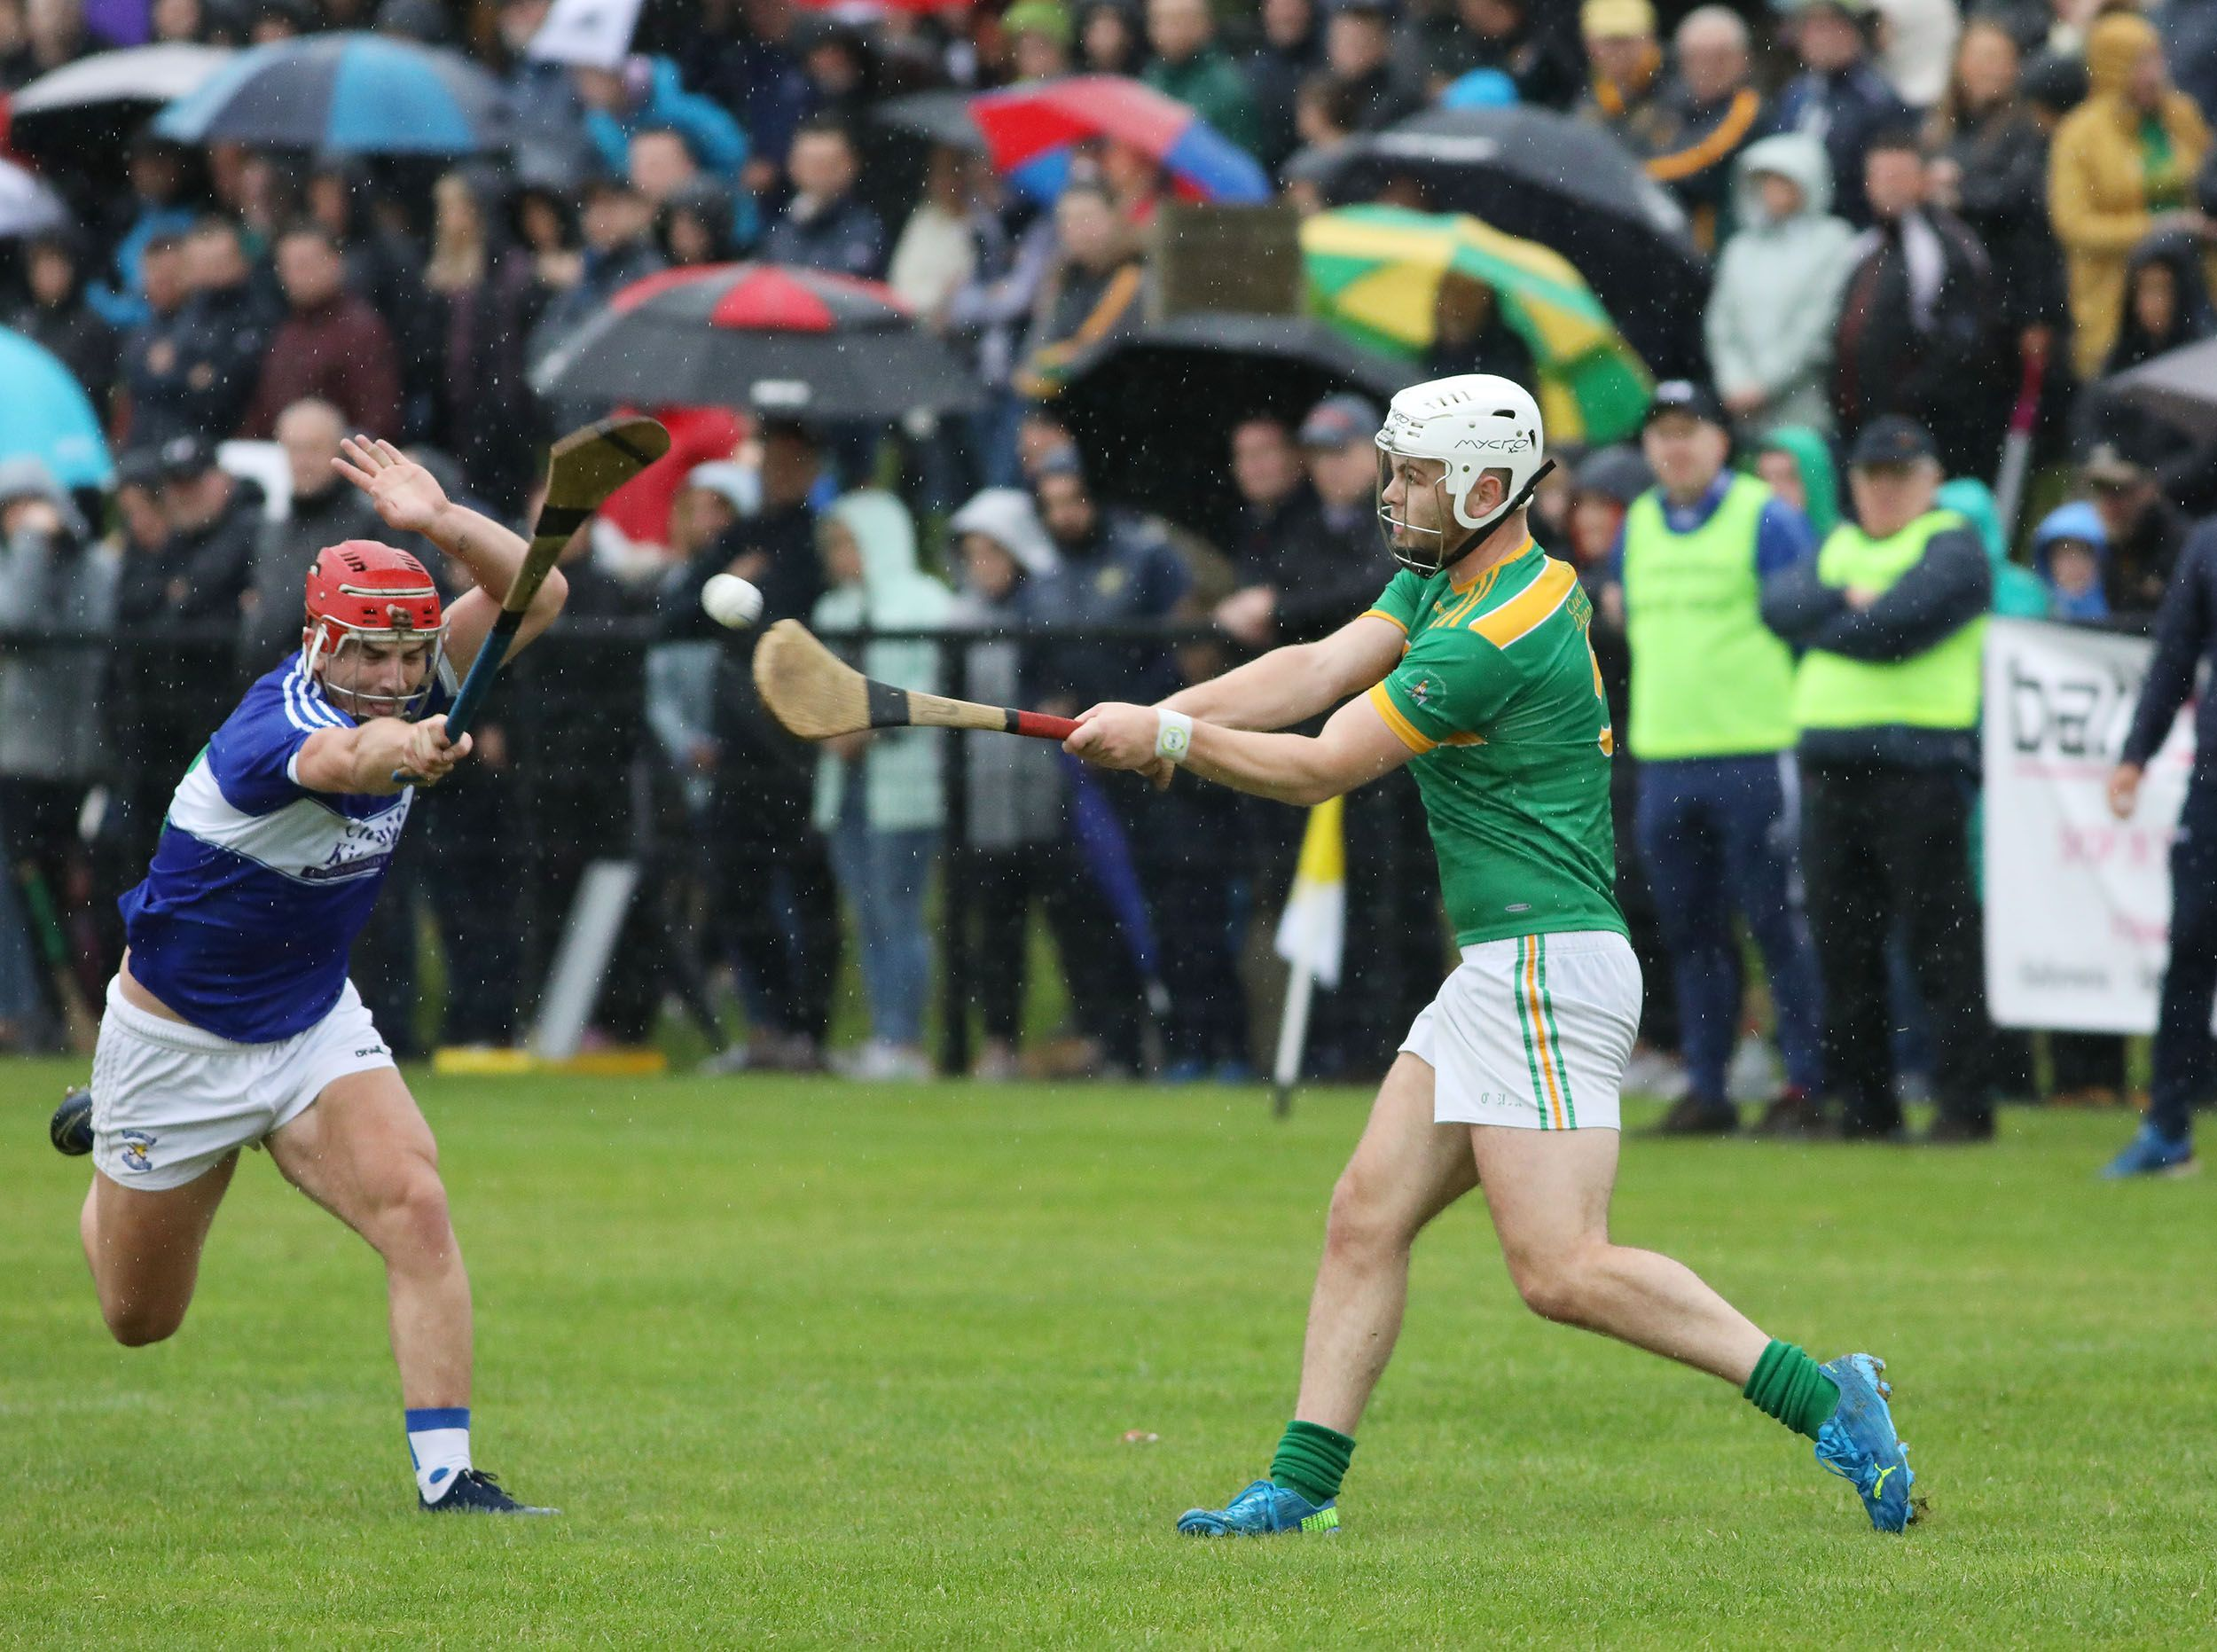 Ronan Molloy gets the ball away as Michael Bradley closes in